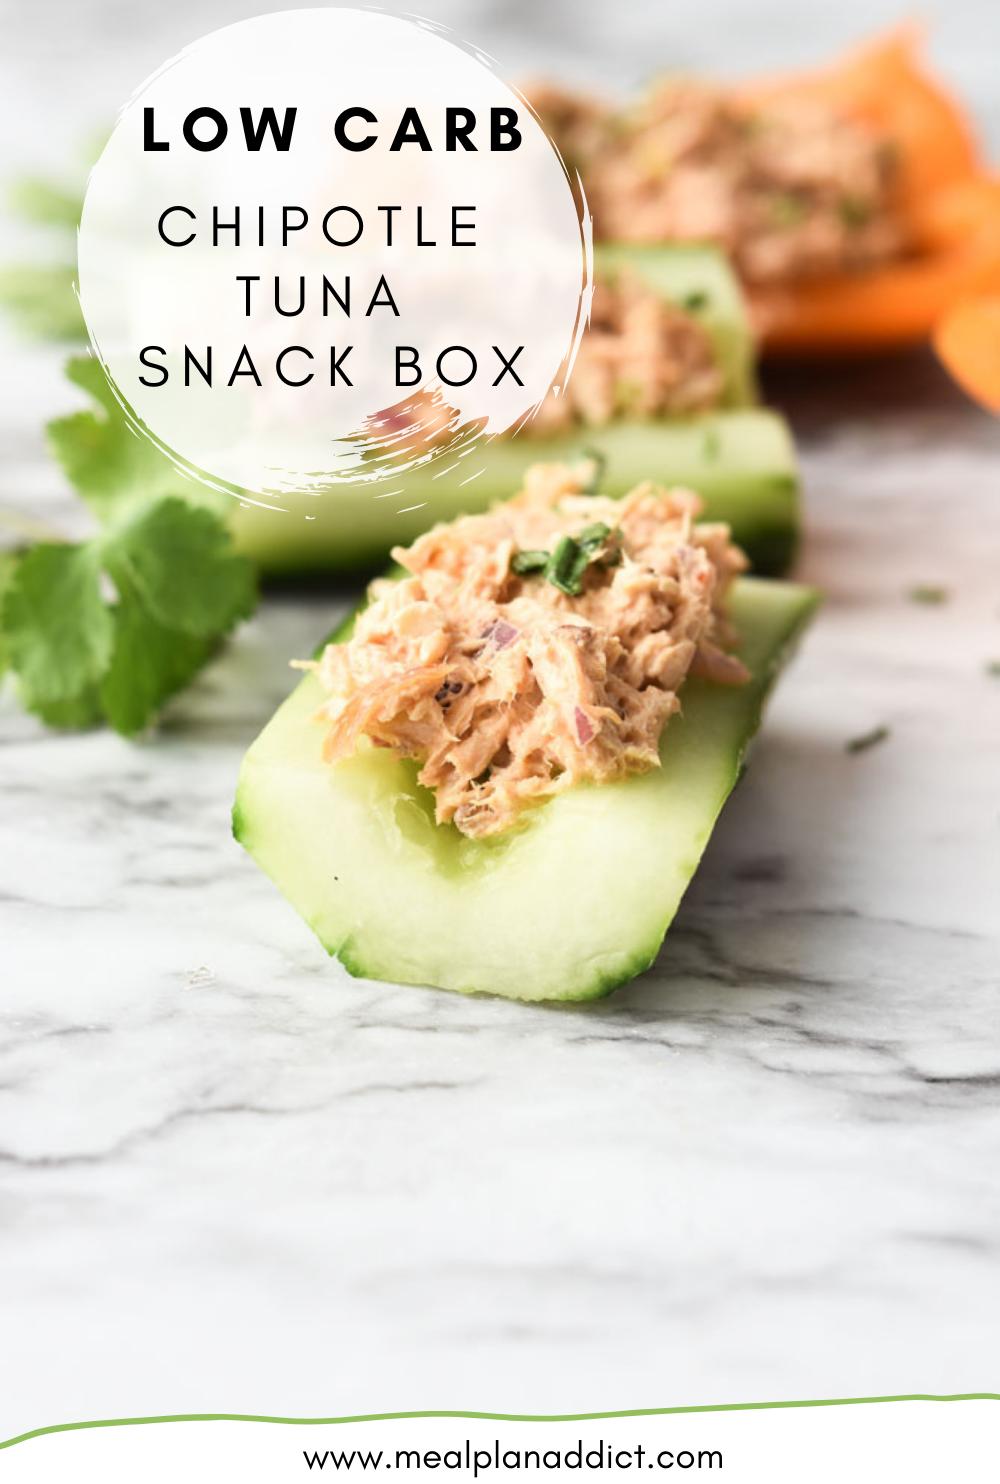 Low Carb Chipotle Tuna Snack Box